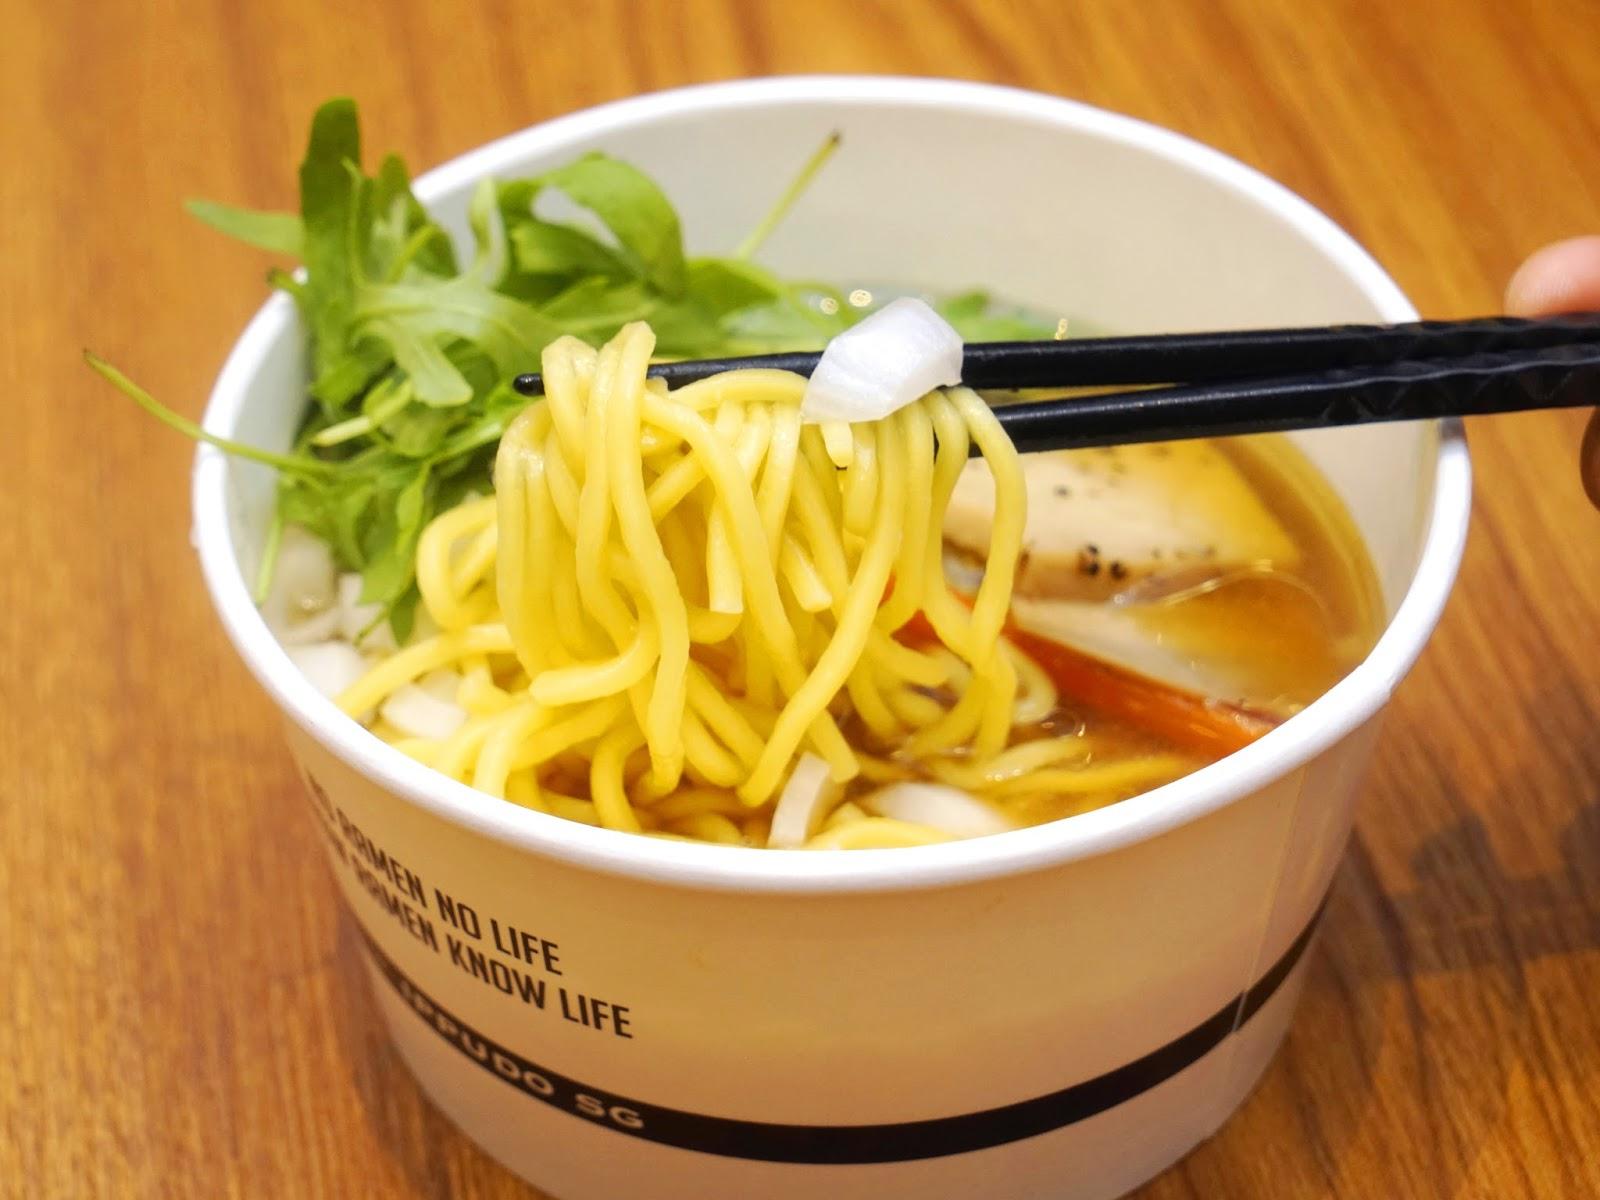 Pinkypiggu: Kuroobi By Ippudo @ Mbs ~ A Ramen Takeaway for Ippudo $10 Ramen